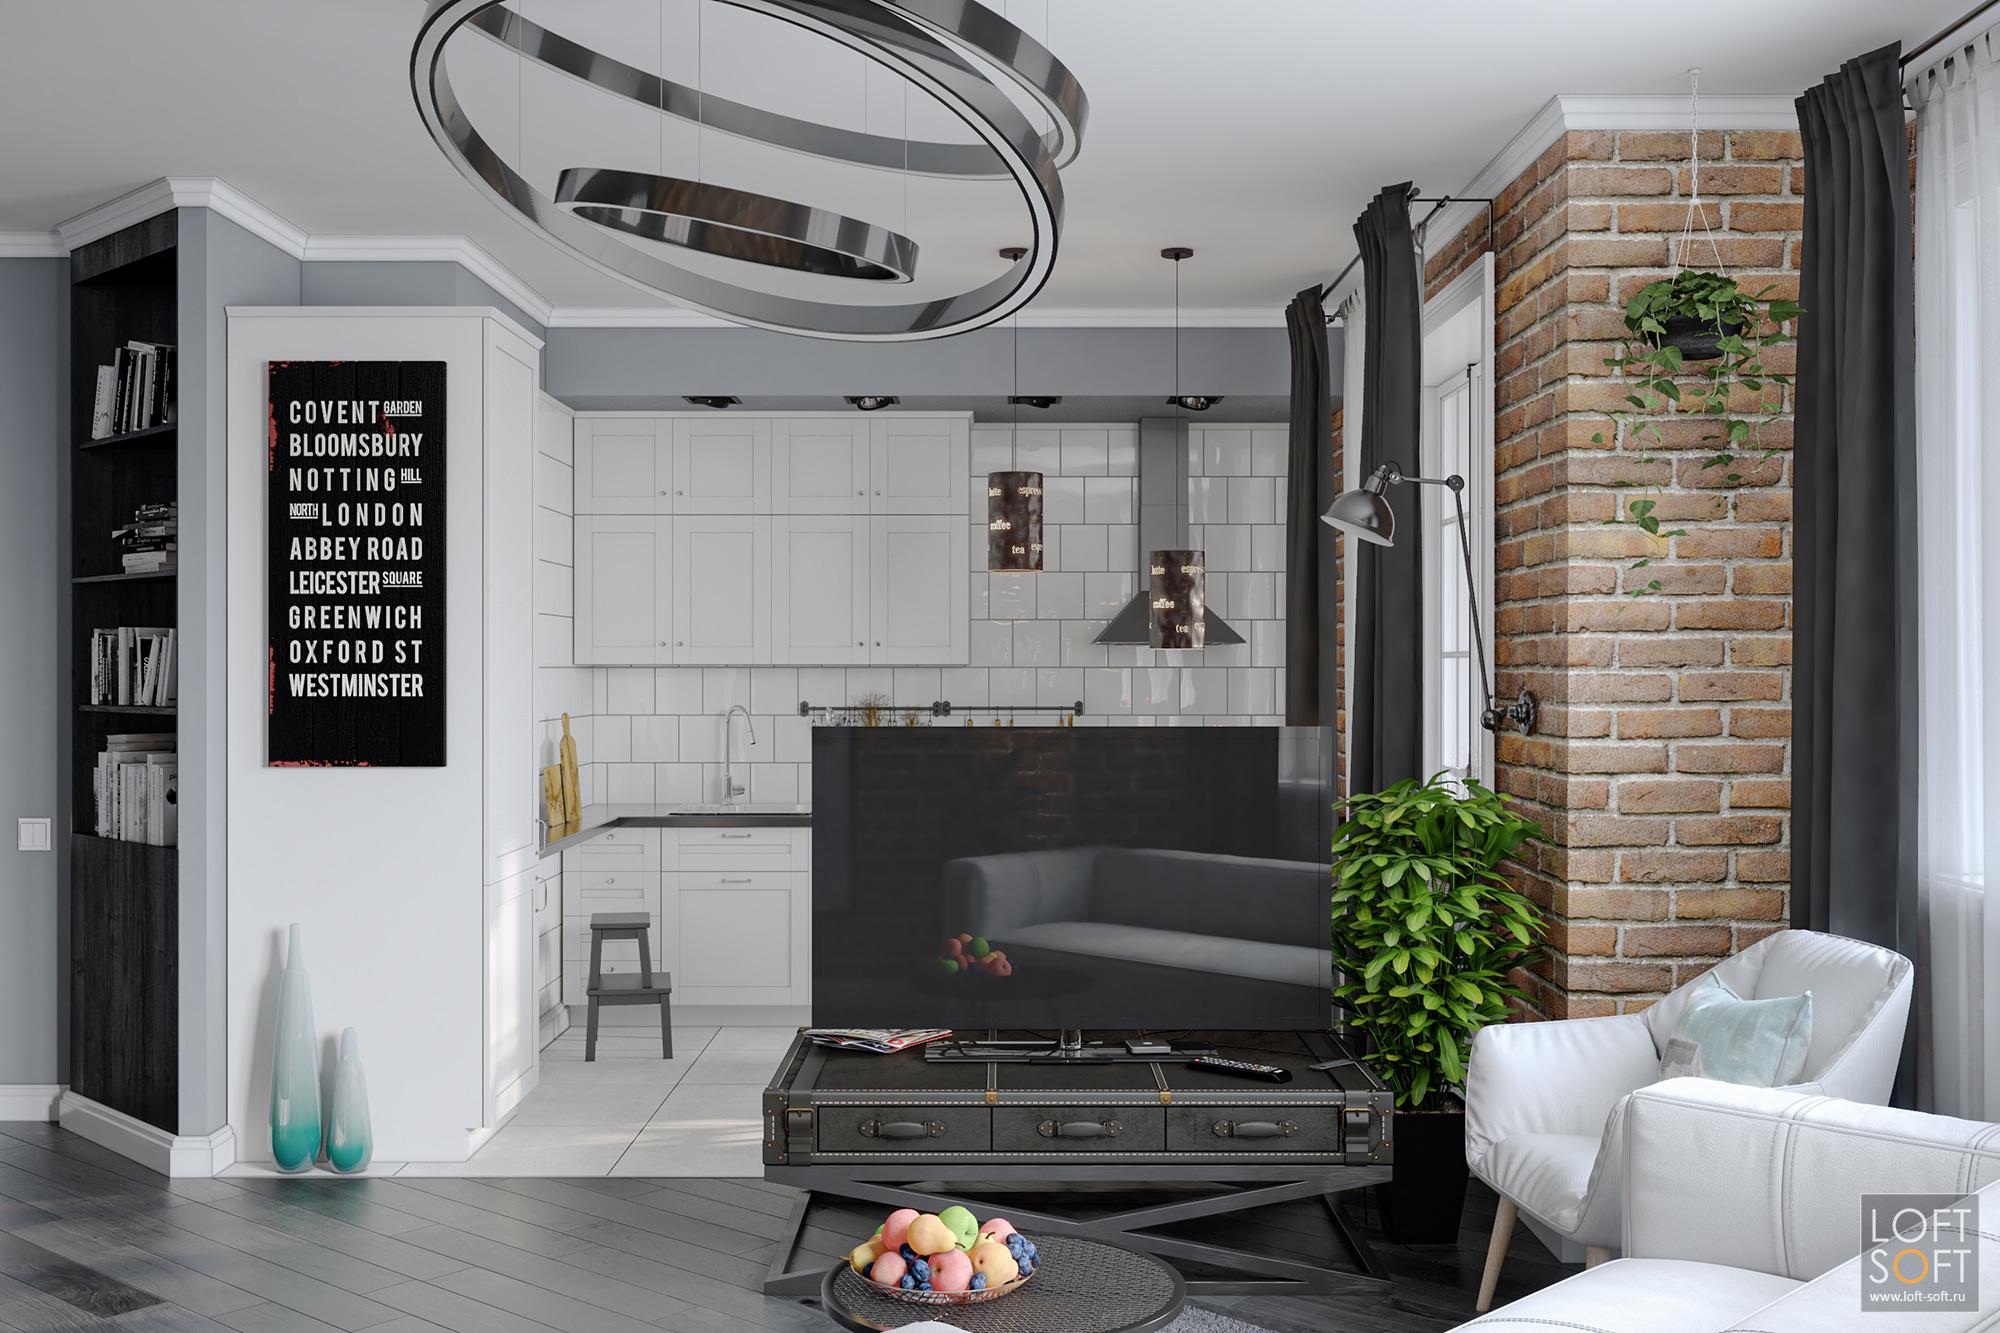 Современный дизайн квартиры. Лофт винтерьере.